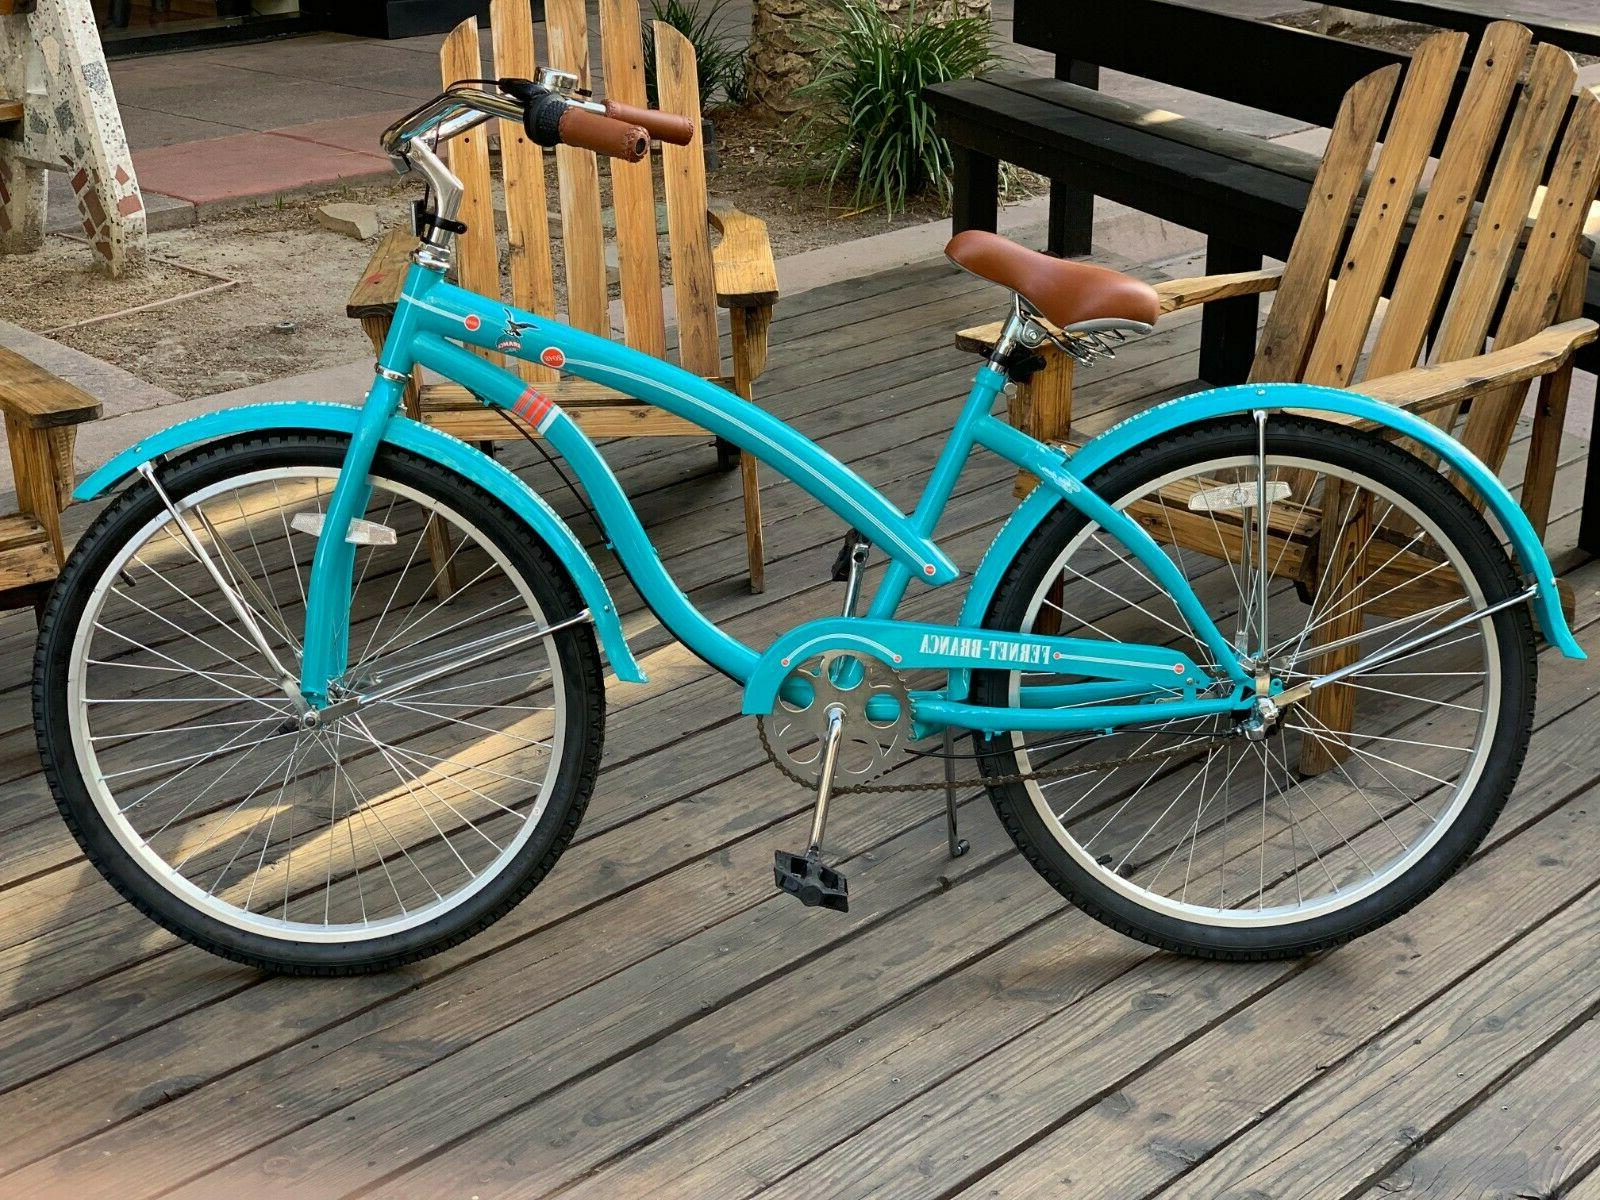 3 Sd Fernet Branca Beach Cruiser Bicycle